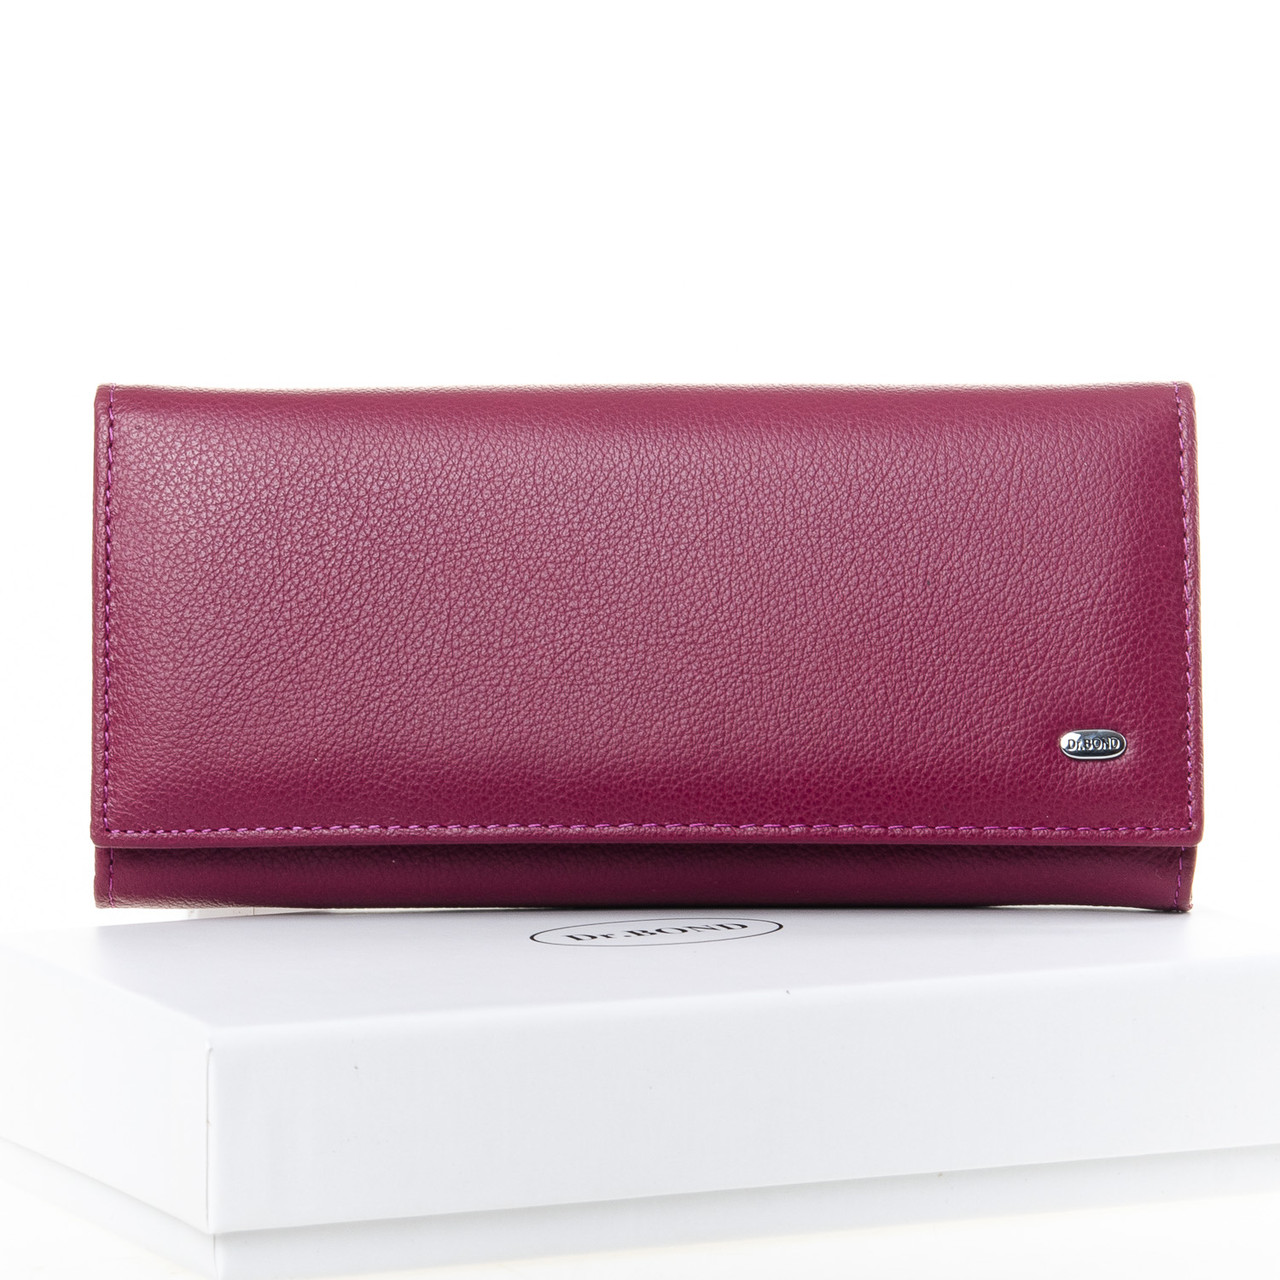 PODIUM Кошелек Classic кожа DR. BOND W501-2 purple-red